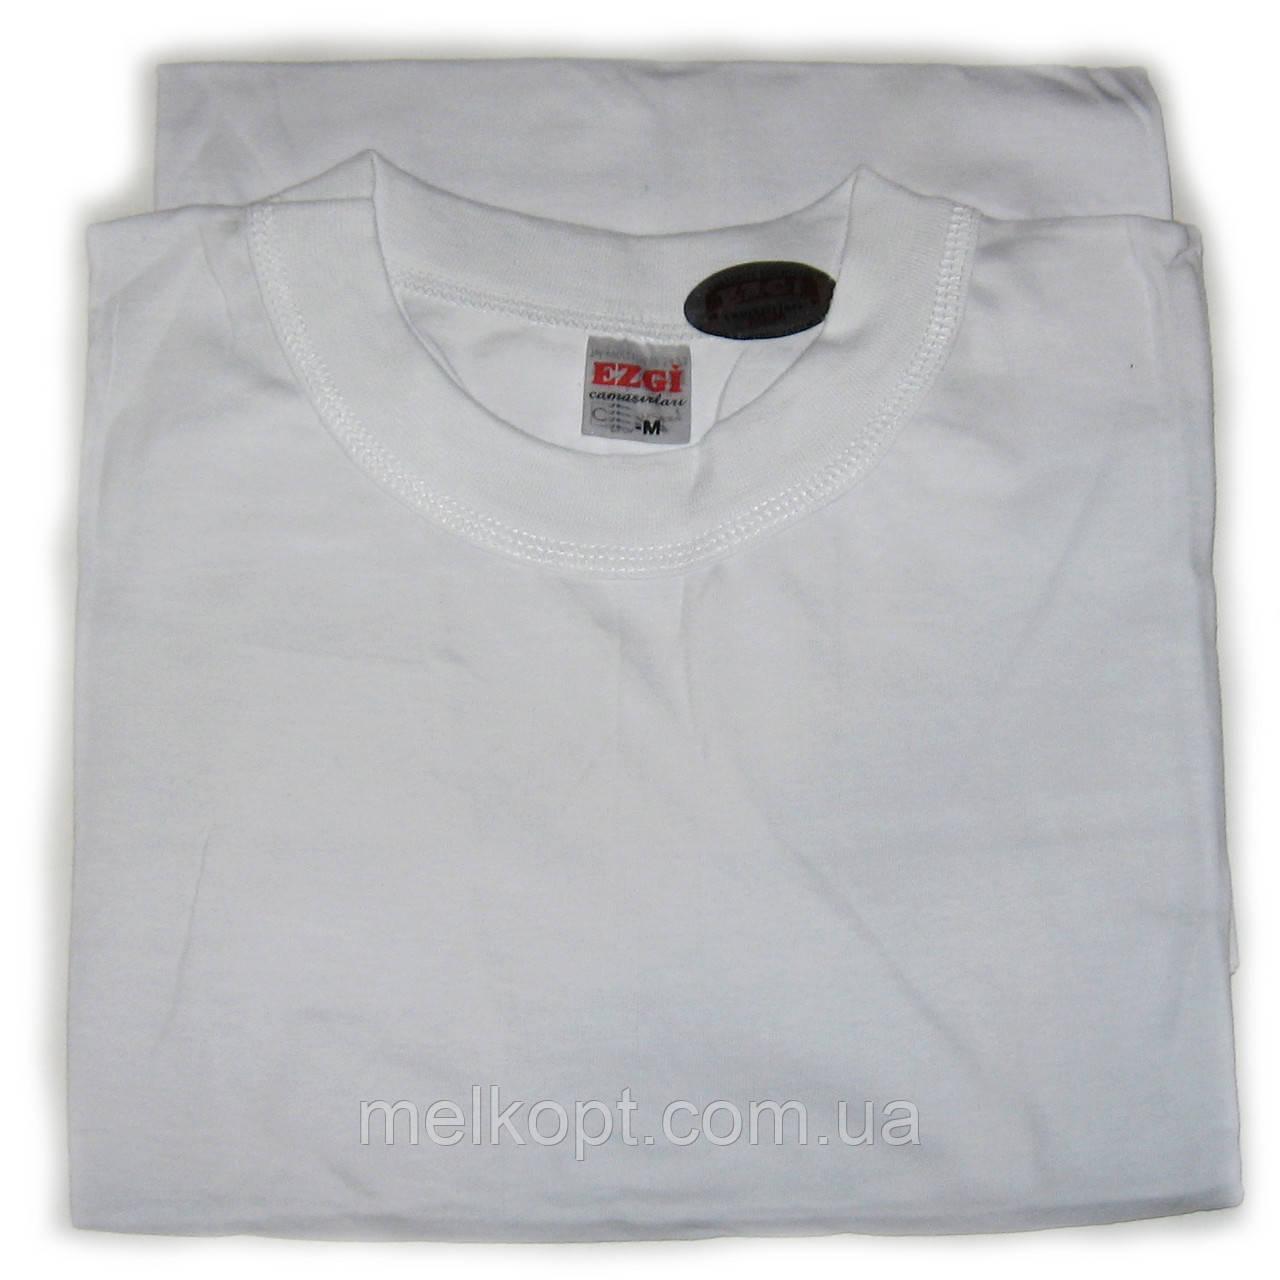 Мужские футболки Ezgi - 48,00 грн./шт. (54-й размер, белые)